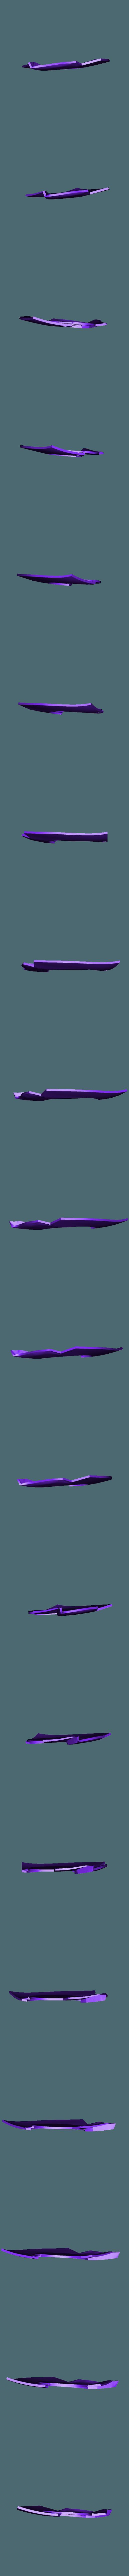 KF_helmet4-3.stl Download free STL file Iron Man Mark III Helmet Separated and Oriented • 3D printer template, KerseyFabrications